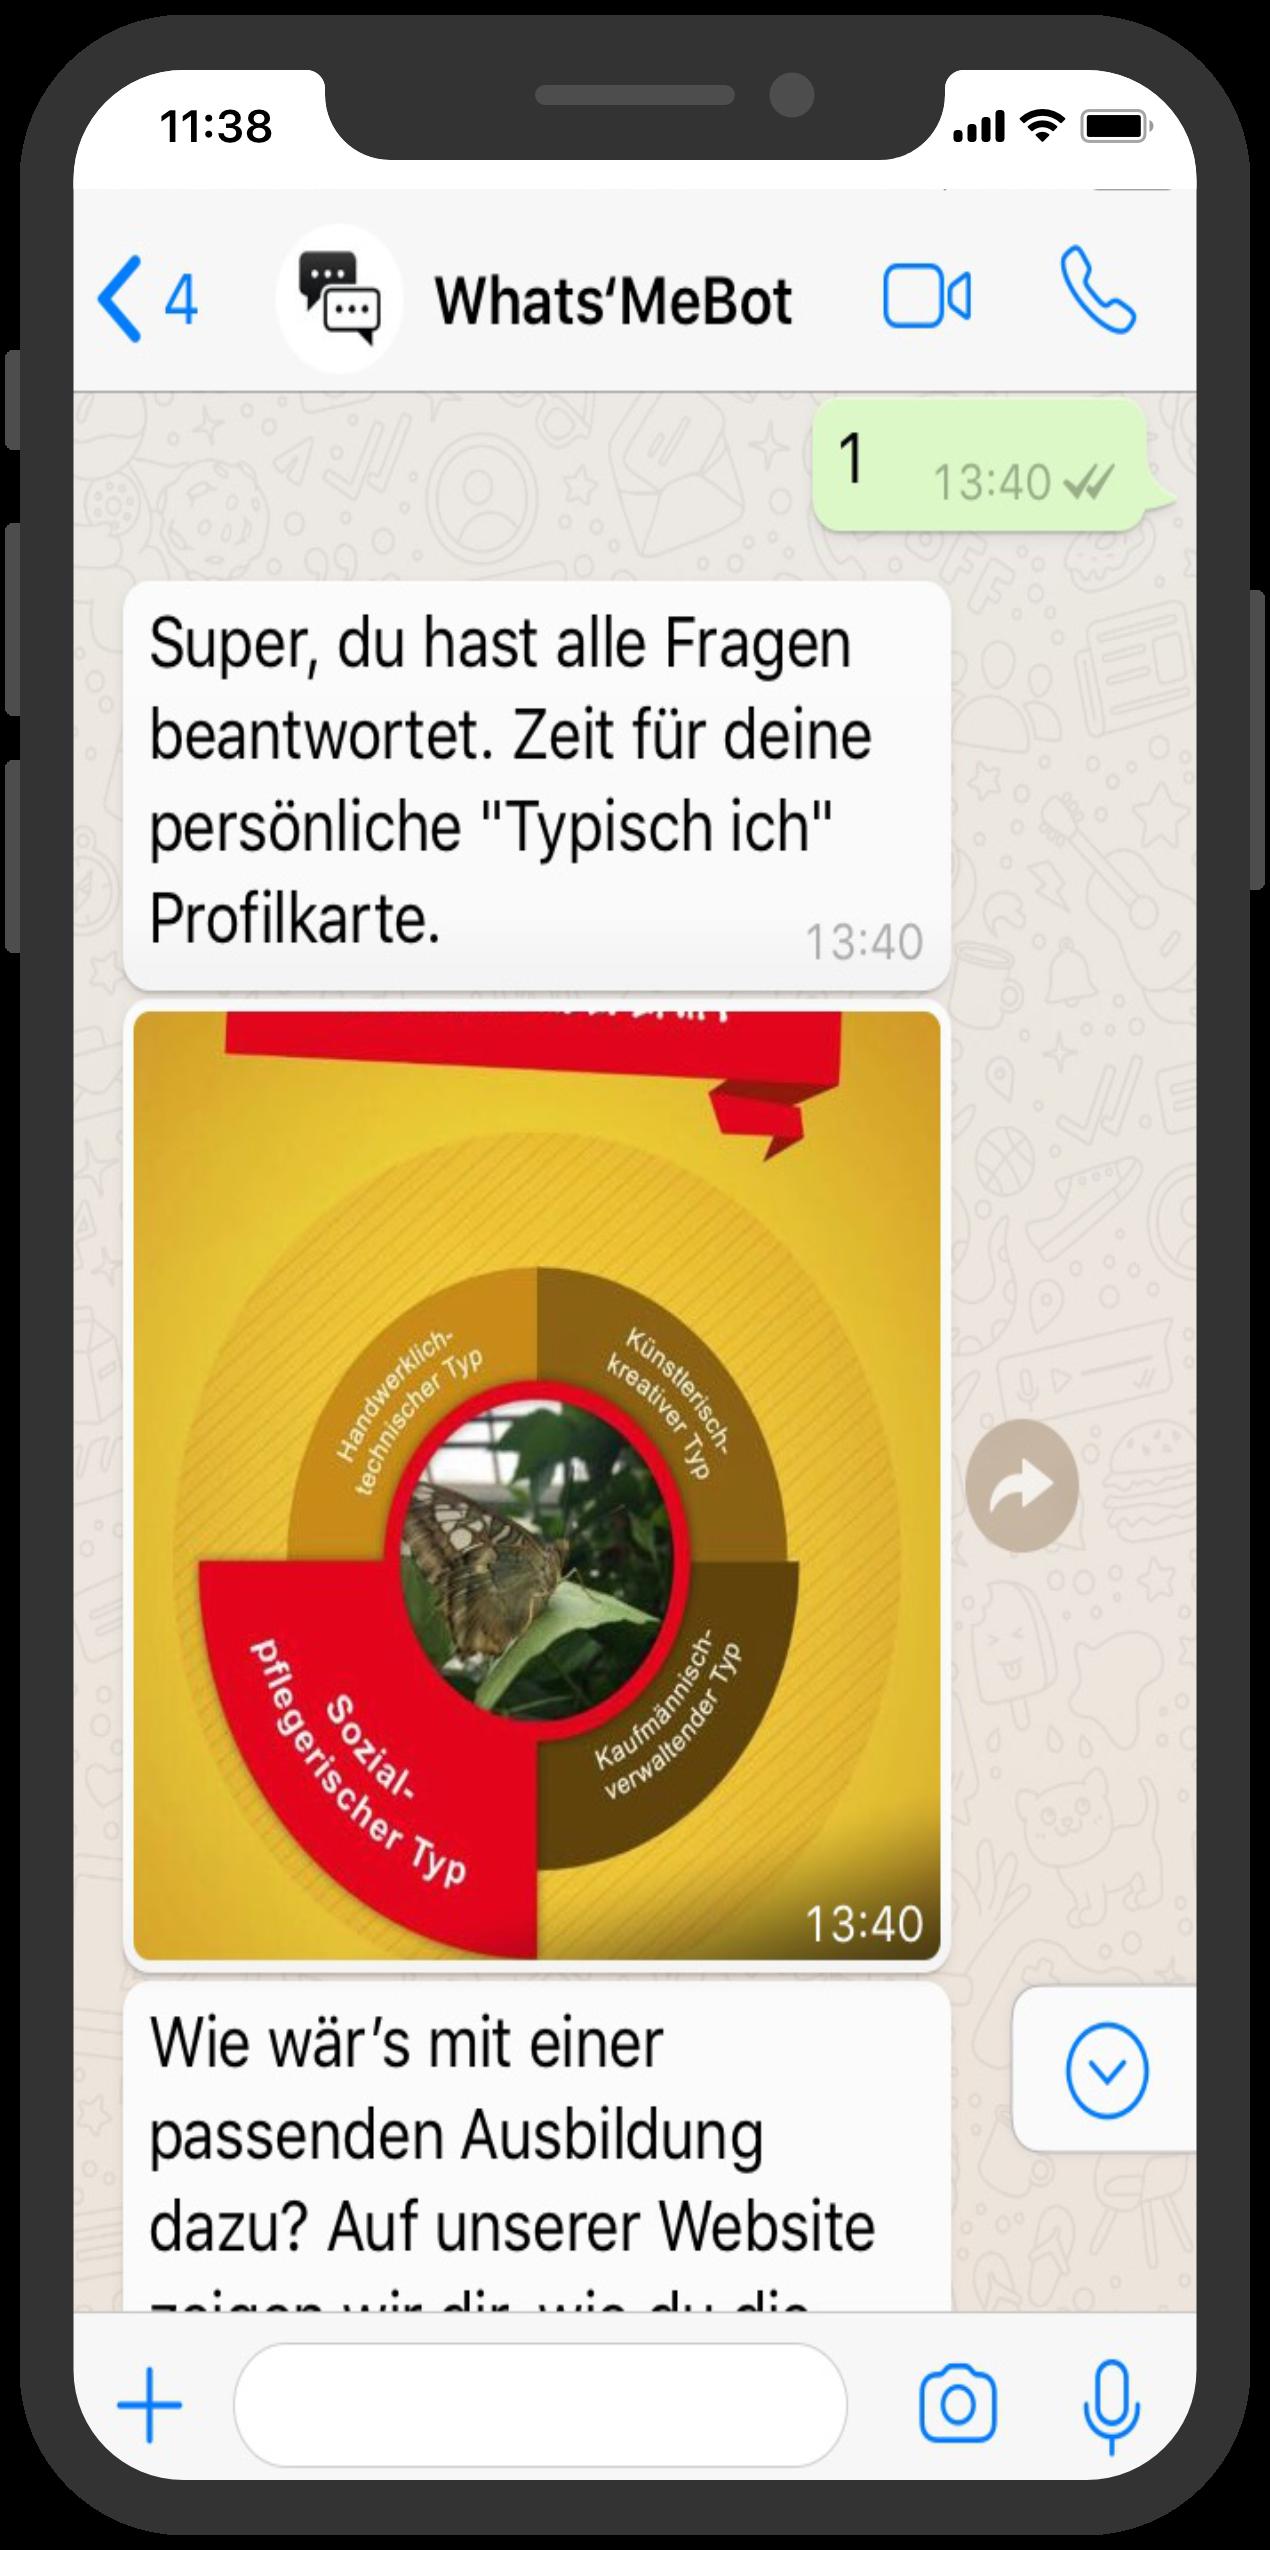 Chatbots-Kundenserivce-WhatsMe-Bot-NewDevice